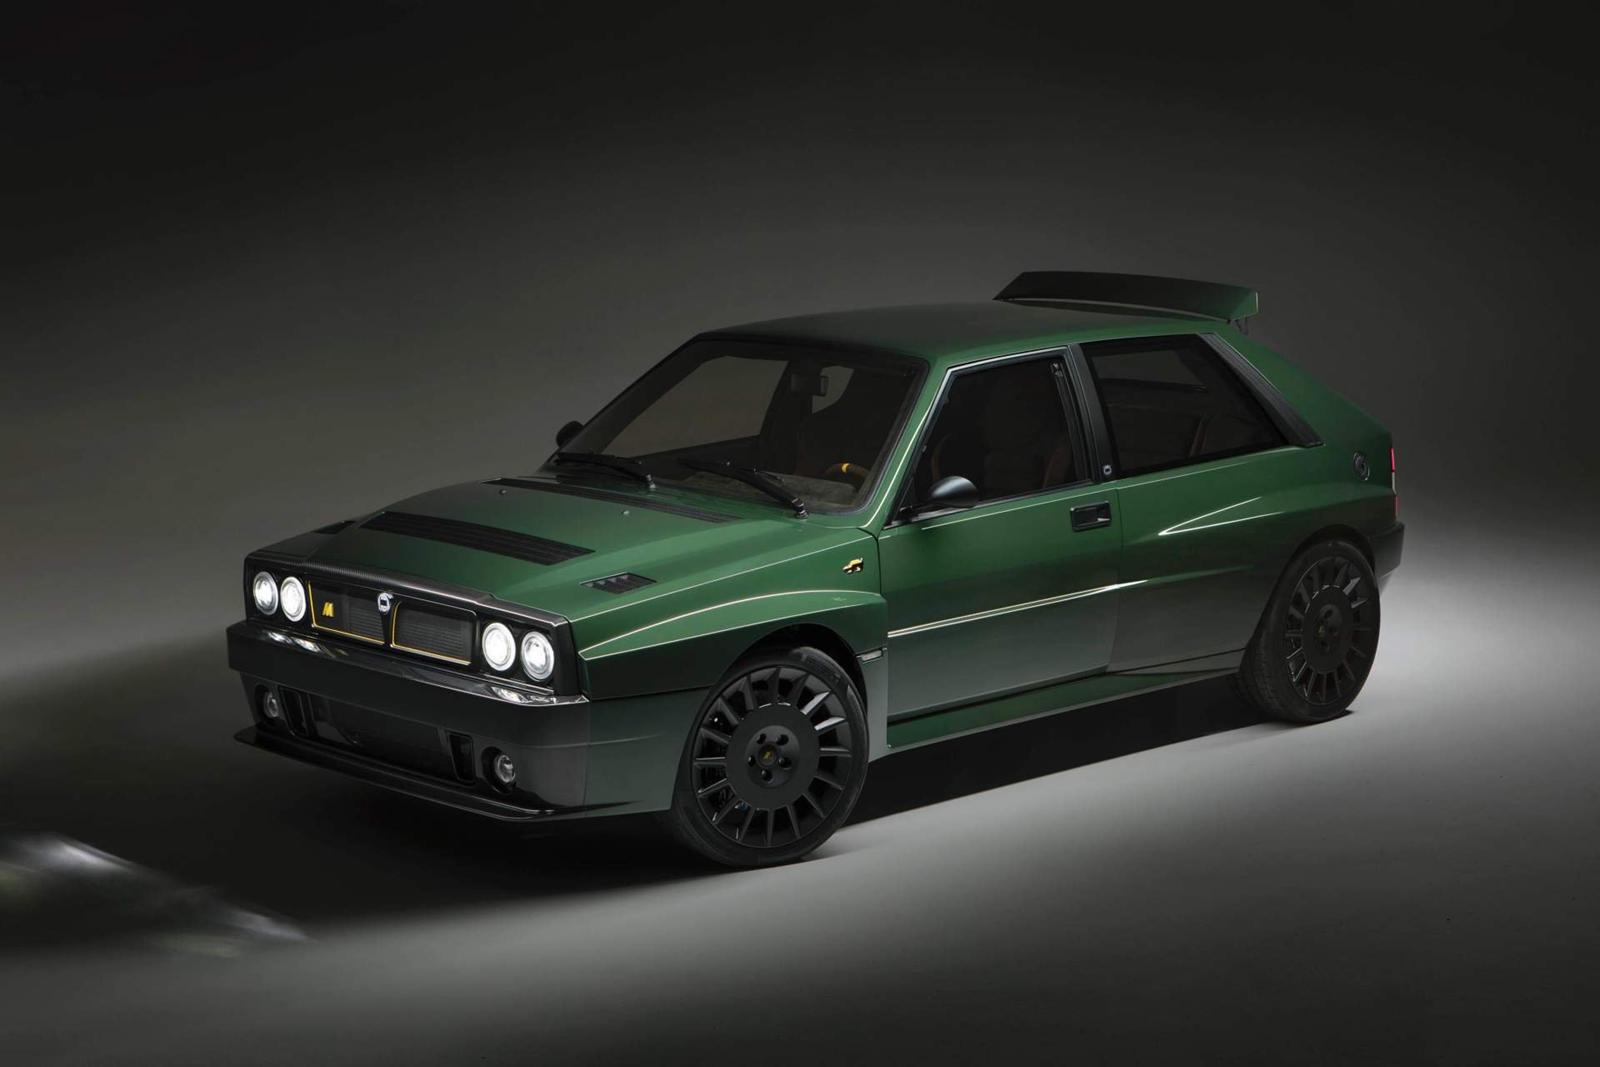 S0-automobili-amos-lancia-delta-futurista-renaissance-d-une-icone-562264.jpg